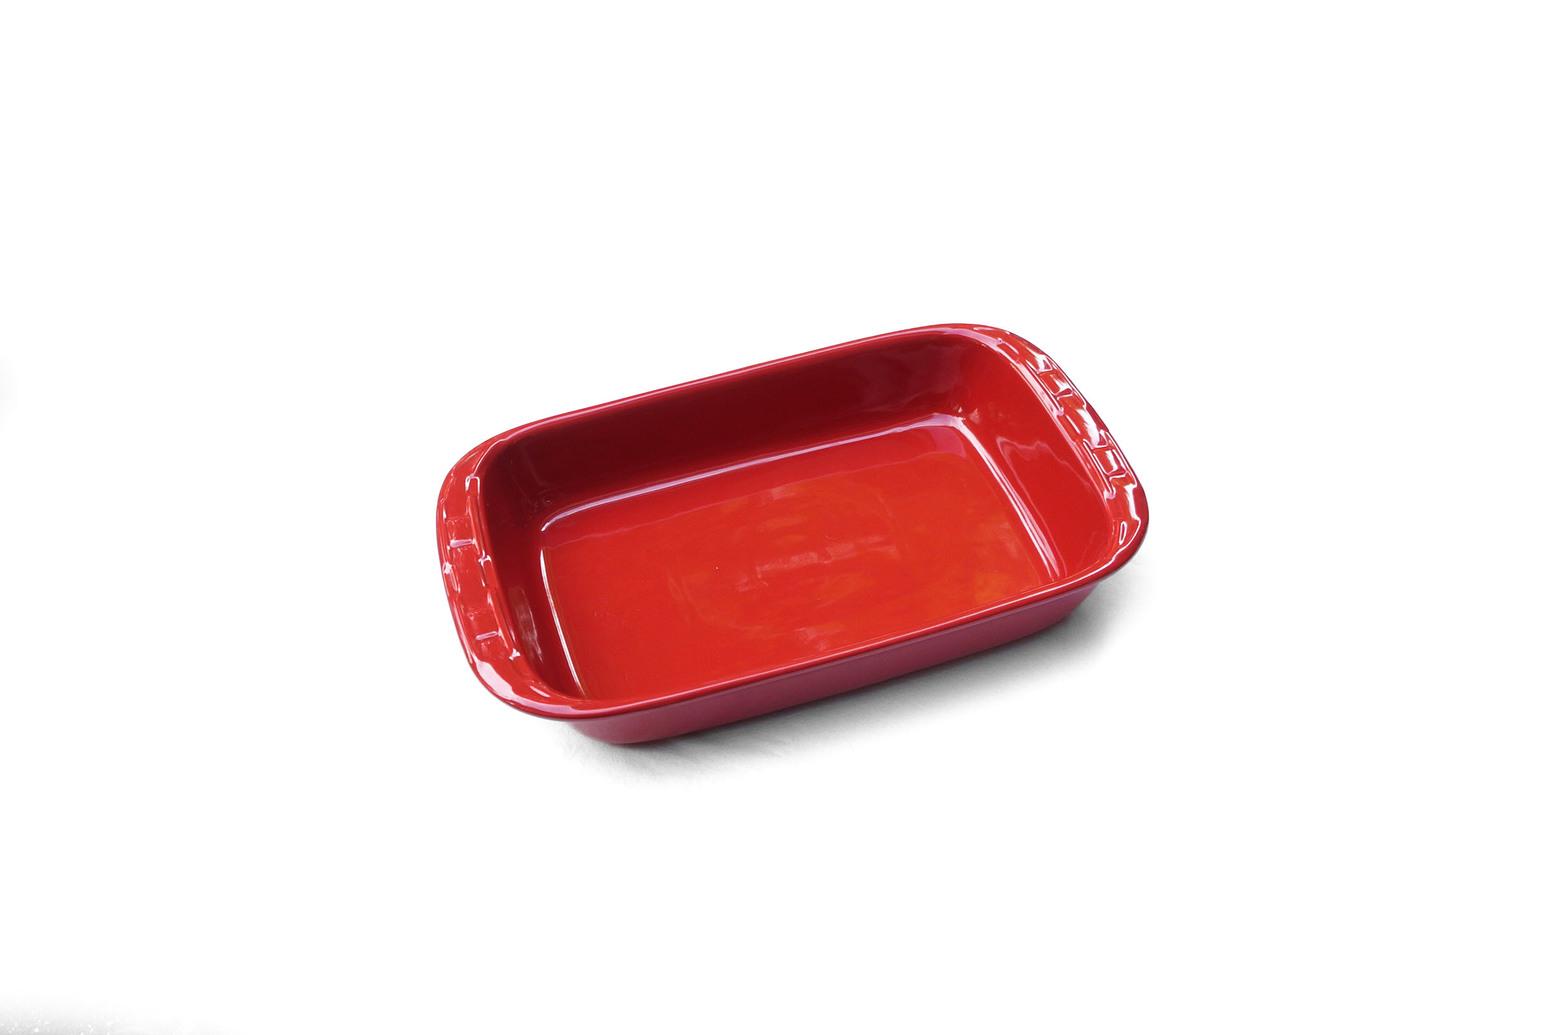 LONGABERGER Pottery Oven Dish/ロンガバーガー オーブンディッシュ グラタン皿 バスケット柄 アメリカ雑貨